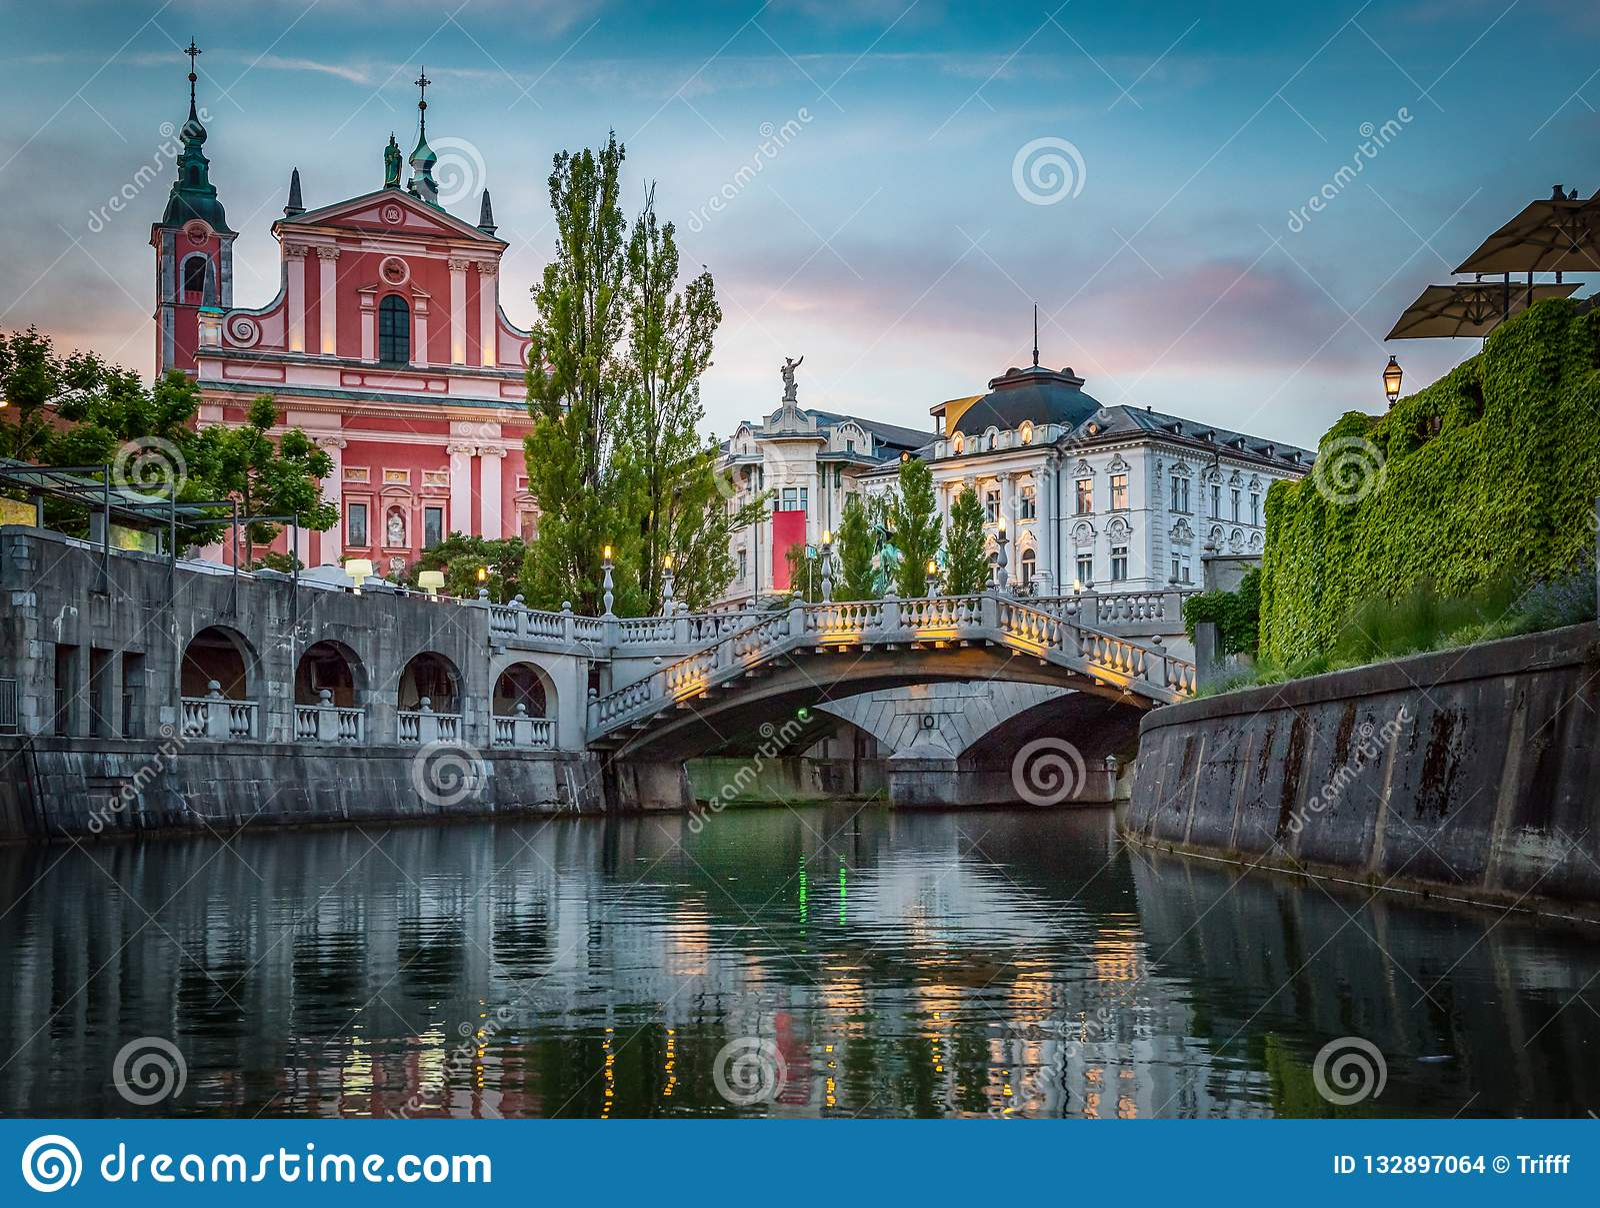 Tromostovje bridge and Ljubljanica river. Ljubljana, Slovenia.